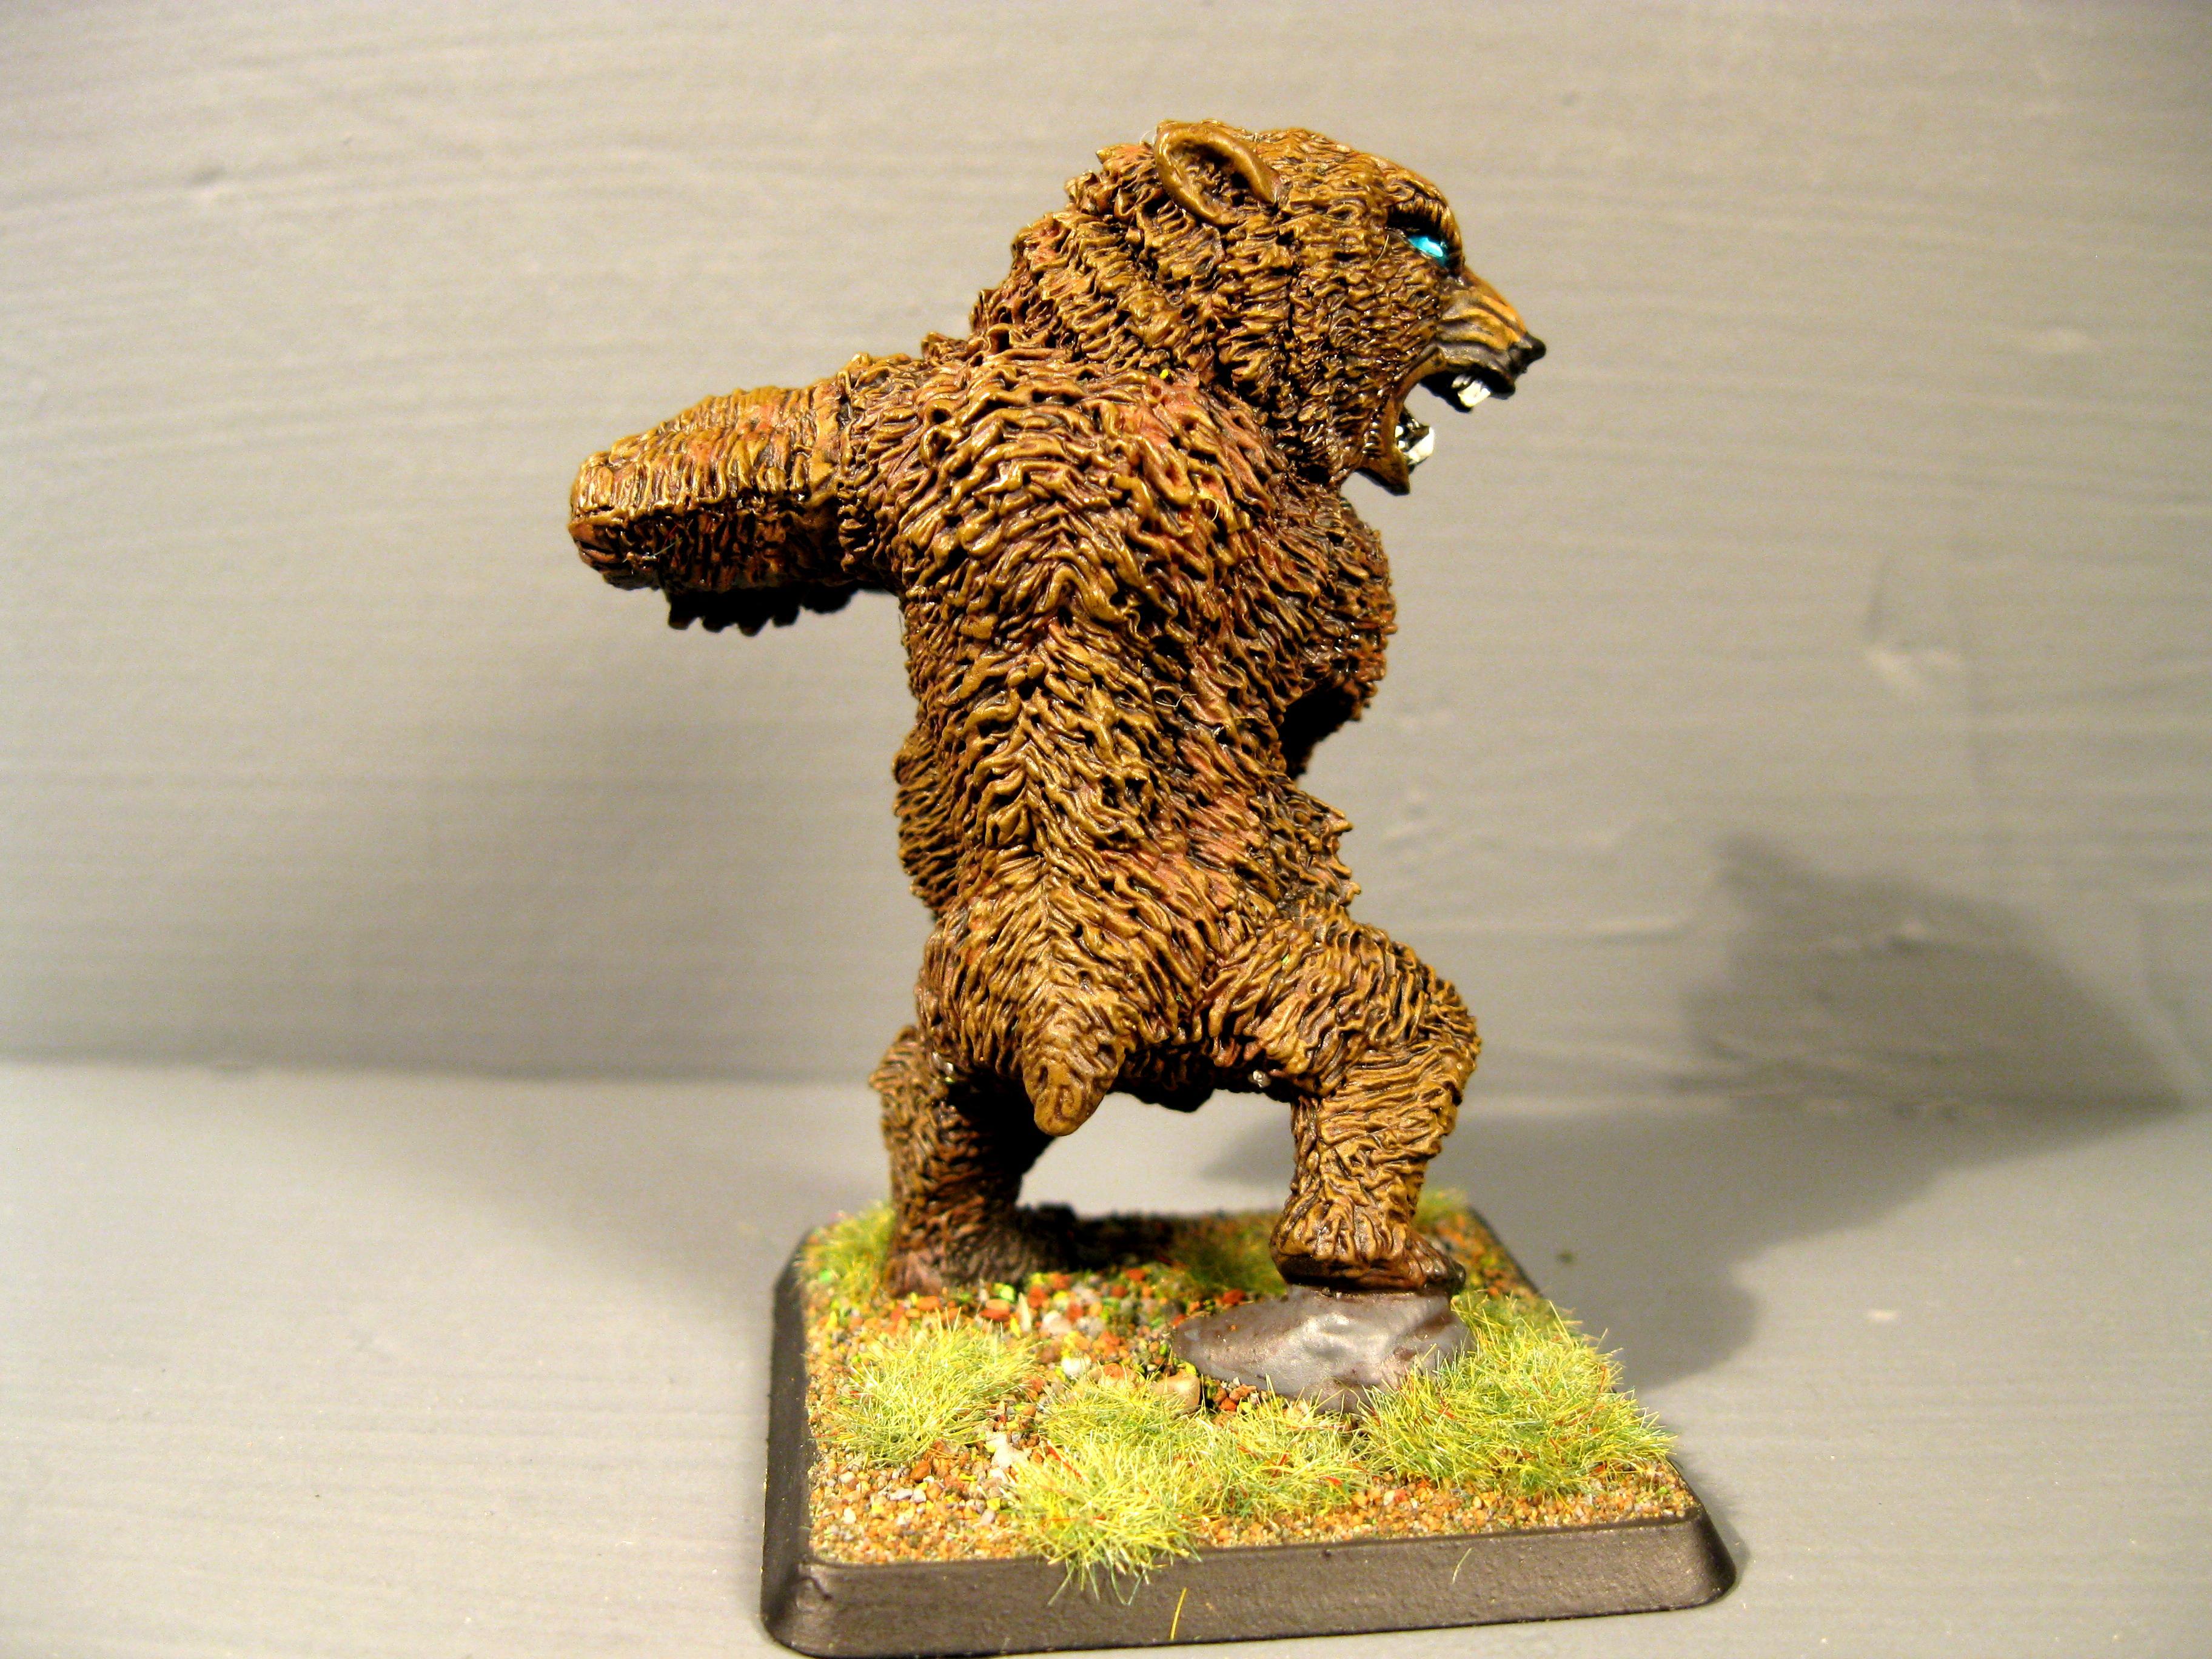 Bear, Pathfinders, Pro Painted, Reaper, Reaper Miniatures, Reaper Minis, Rpg, Warhammer Fantasy